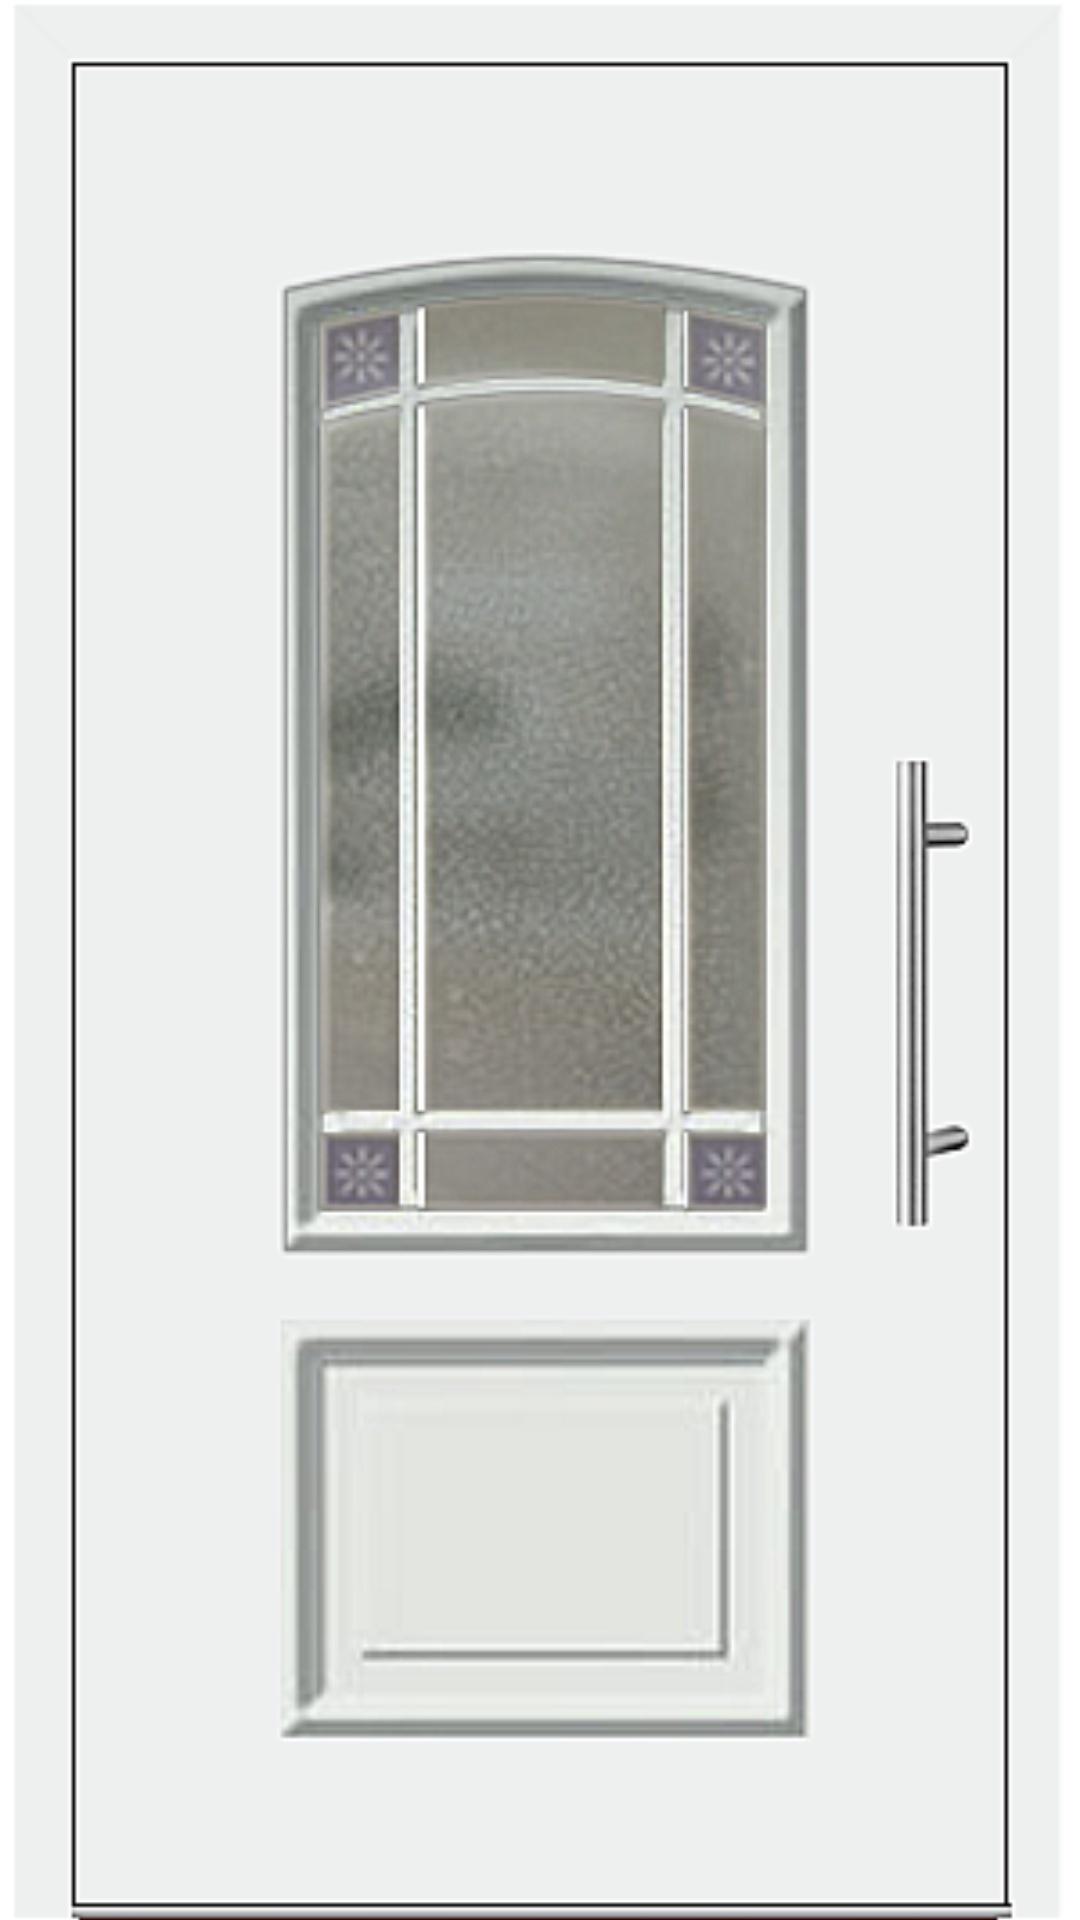 Aluminium Haustür Modell 6456-15 weiß